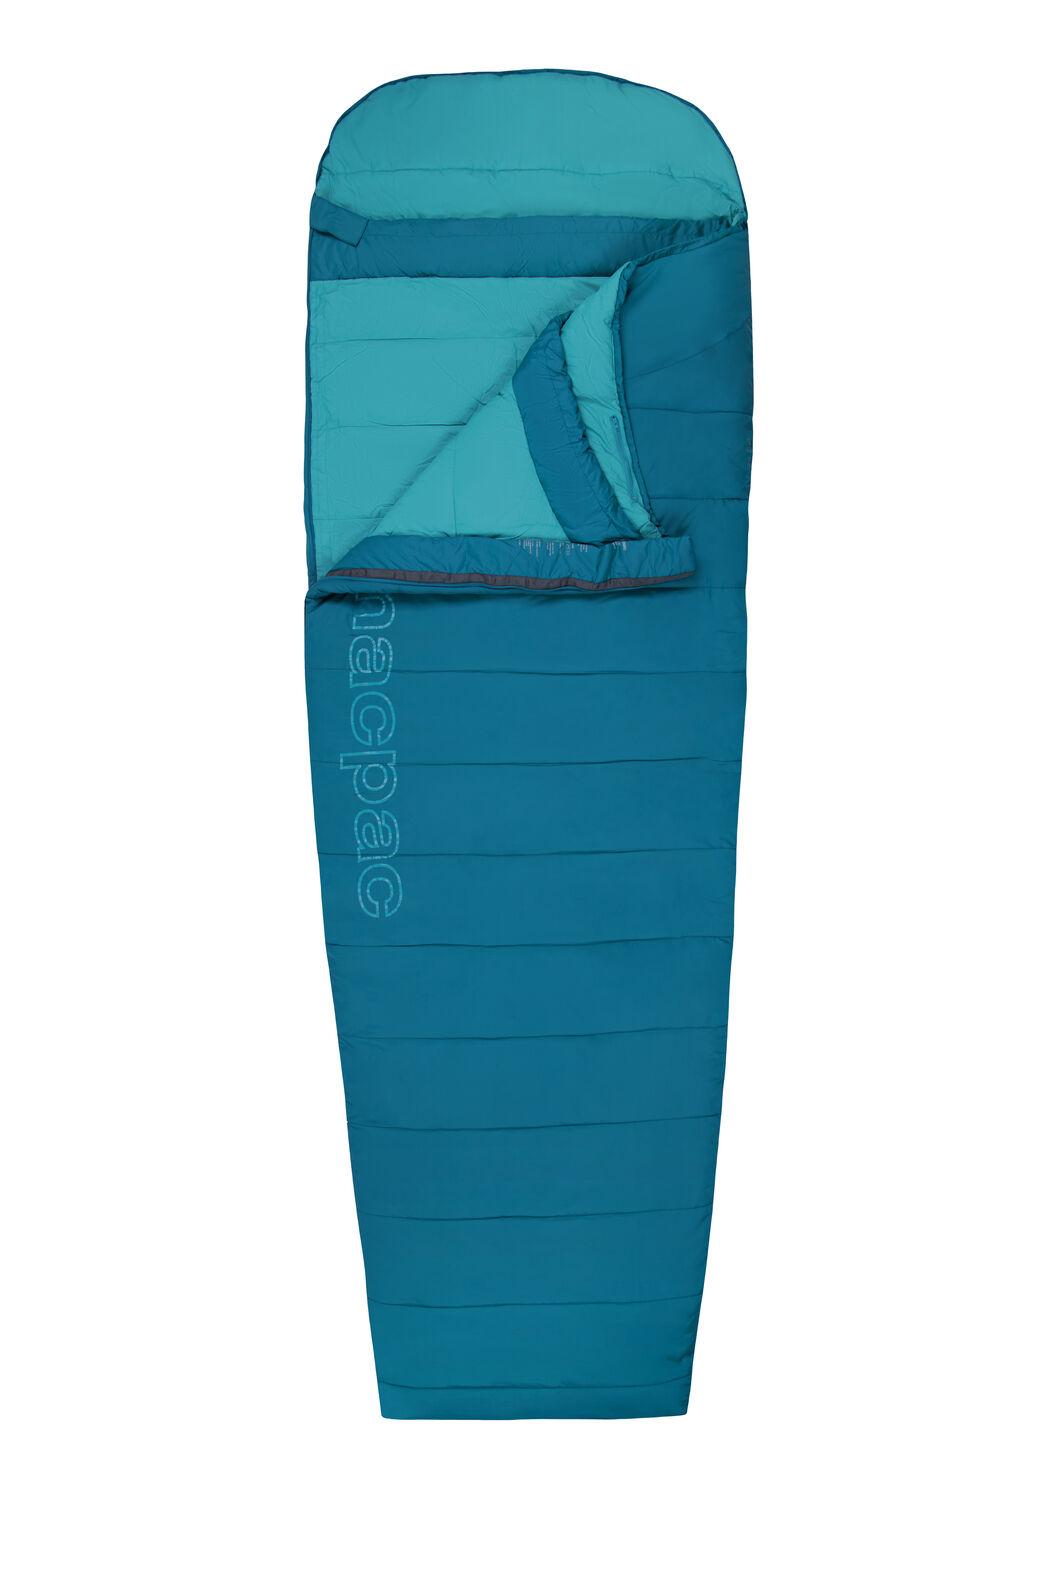 Macpac Roam 200 Sleeping Bag — Extra Large, Morrocan Blue/Larkspur, hi-res